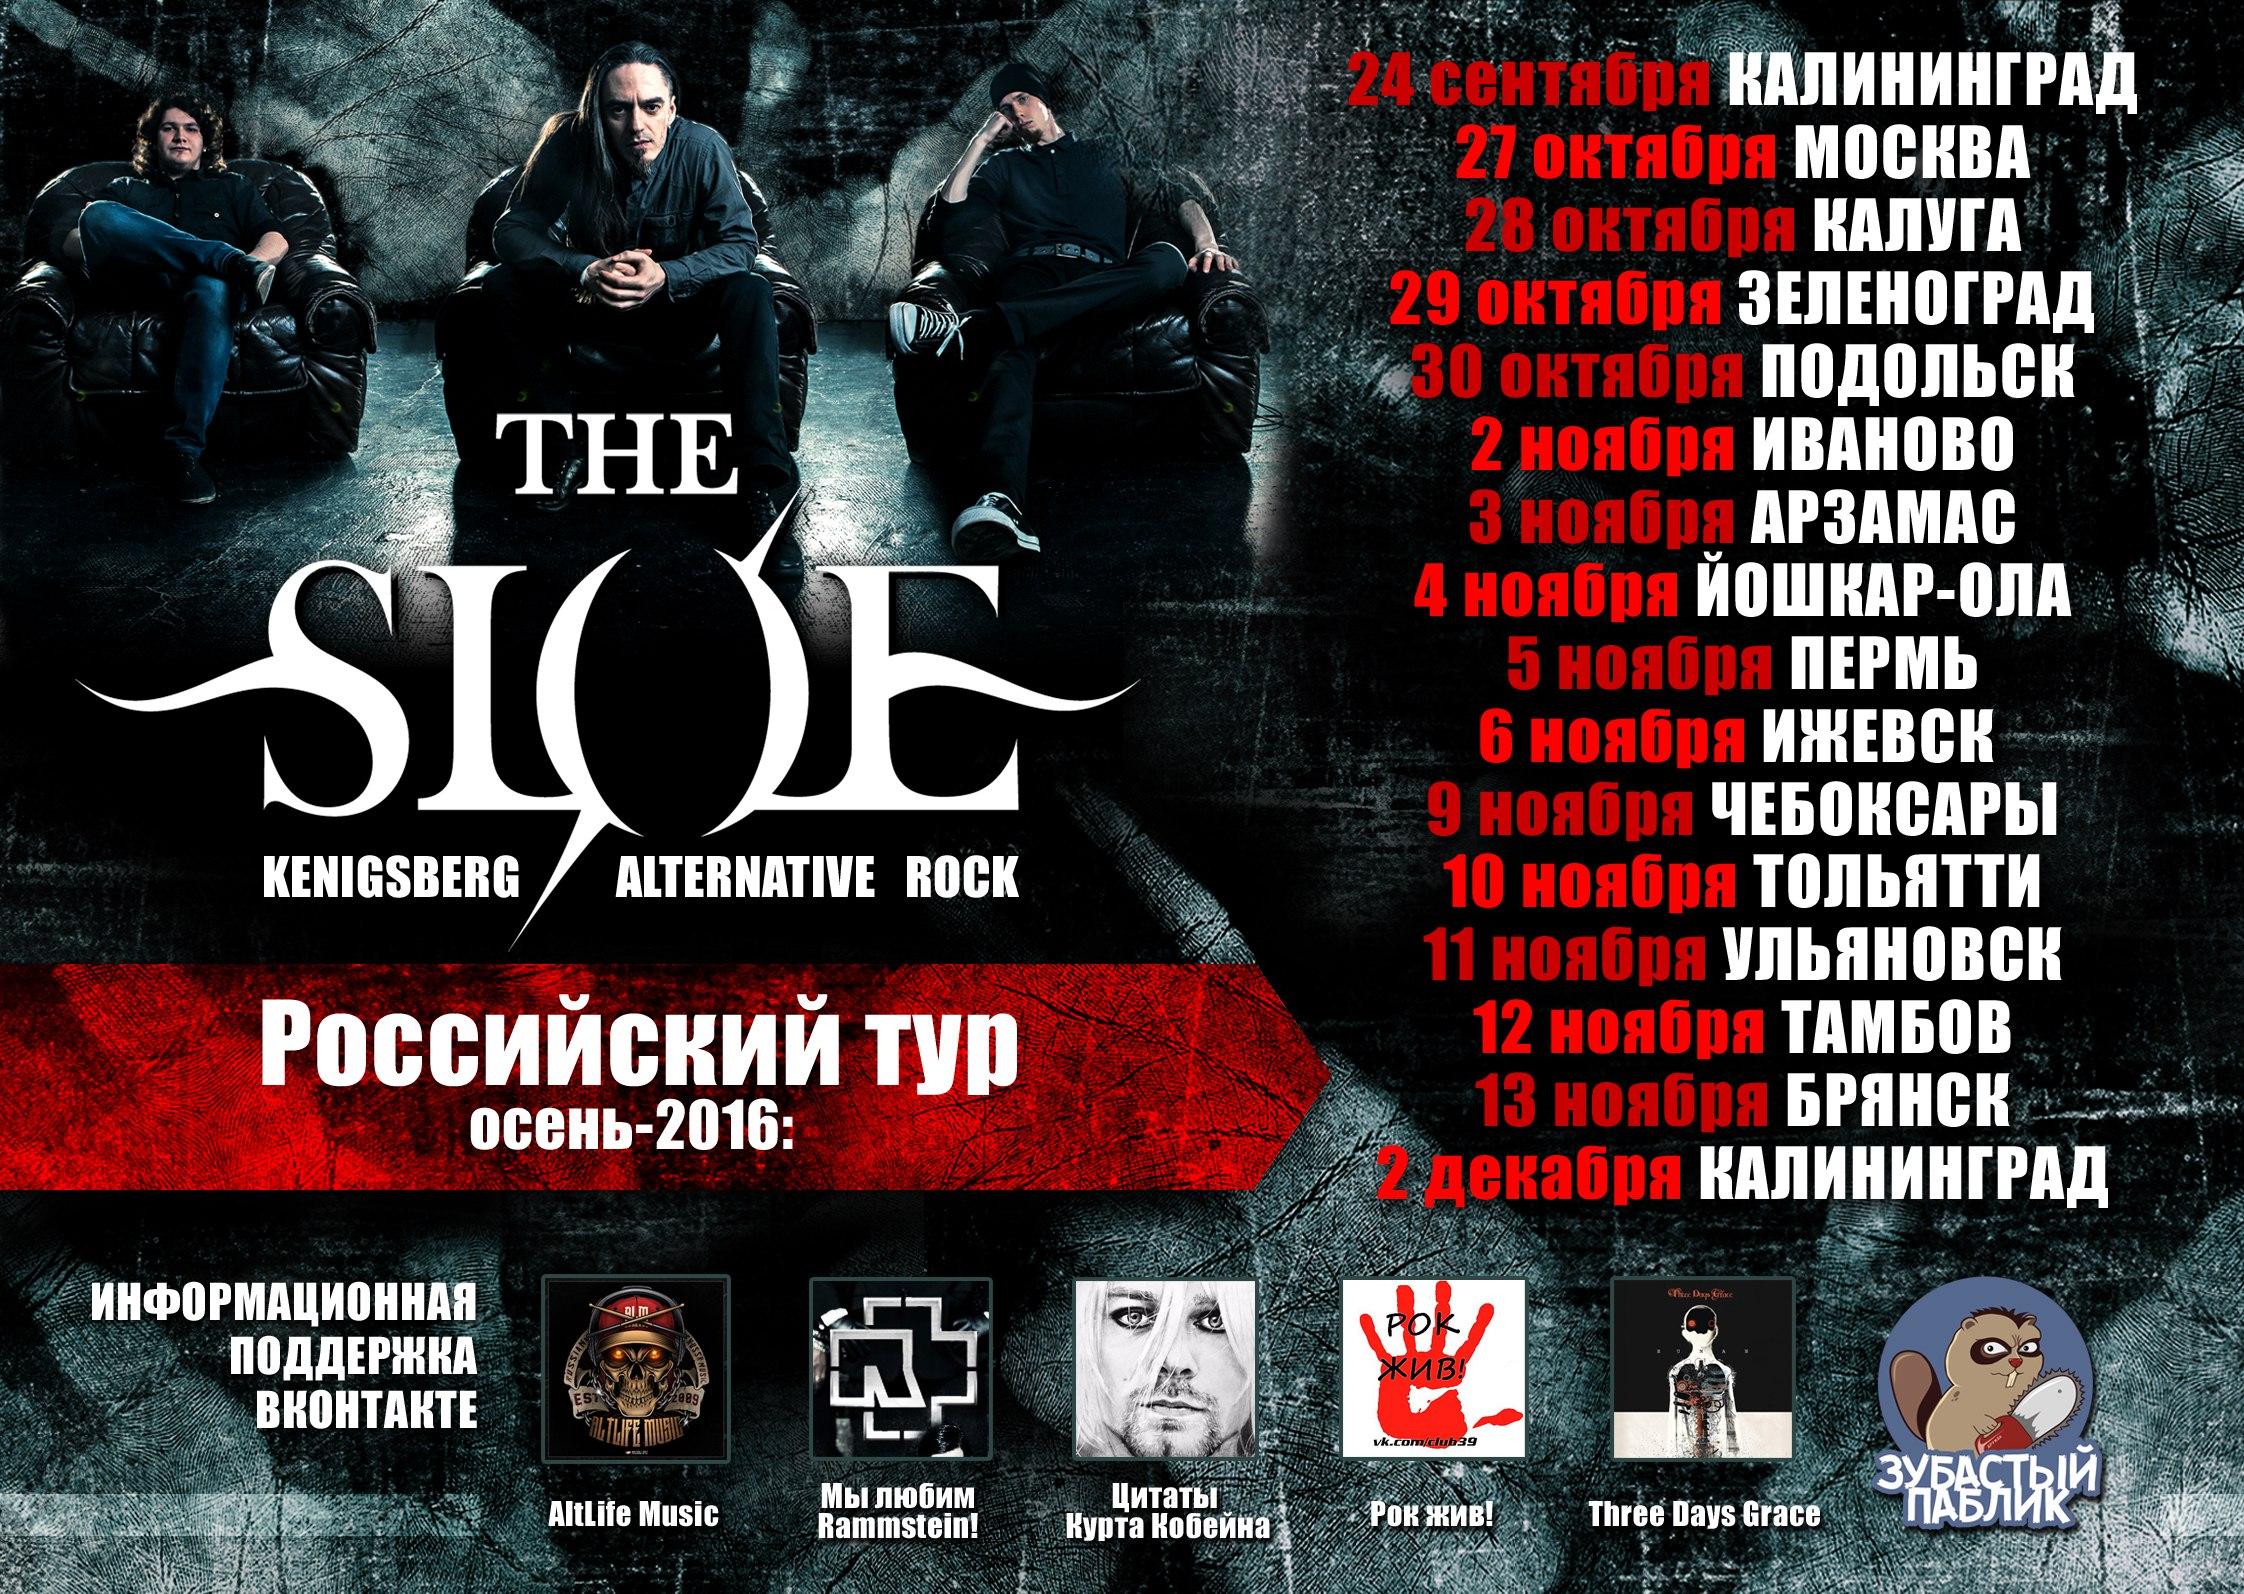 Российский тур группы The SLOE